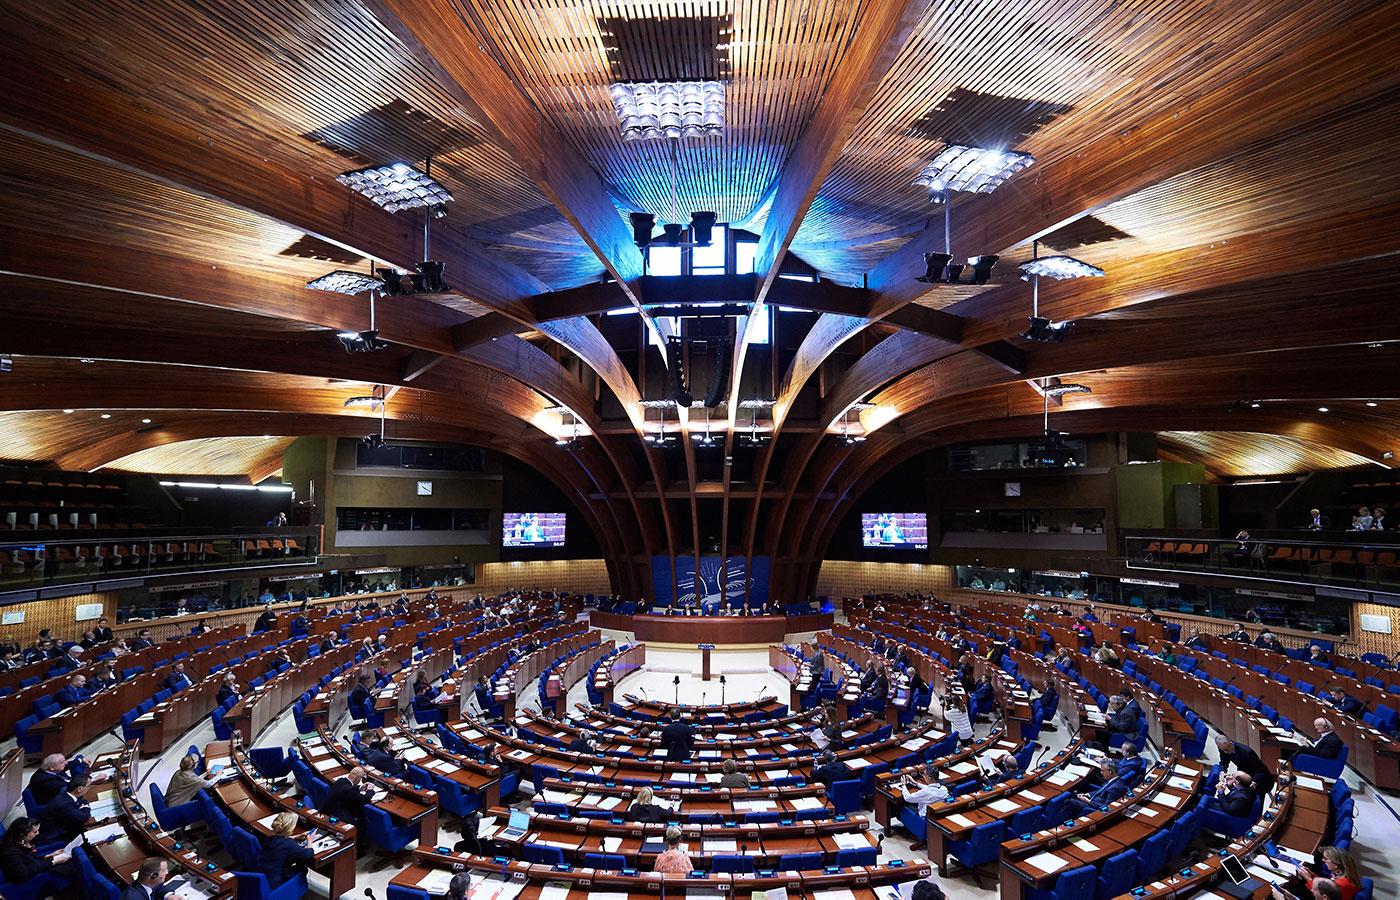 Council of Europe Strasbourg. Photo Ellen Wuibaux.